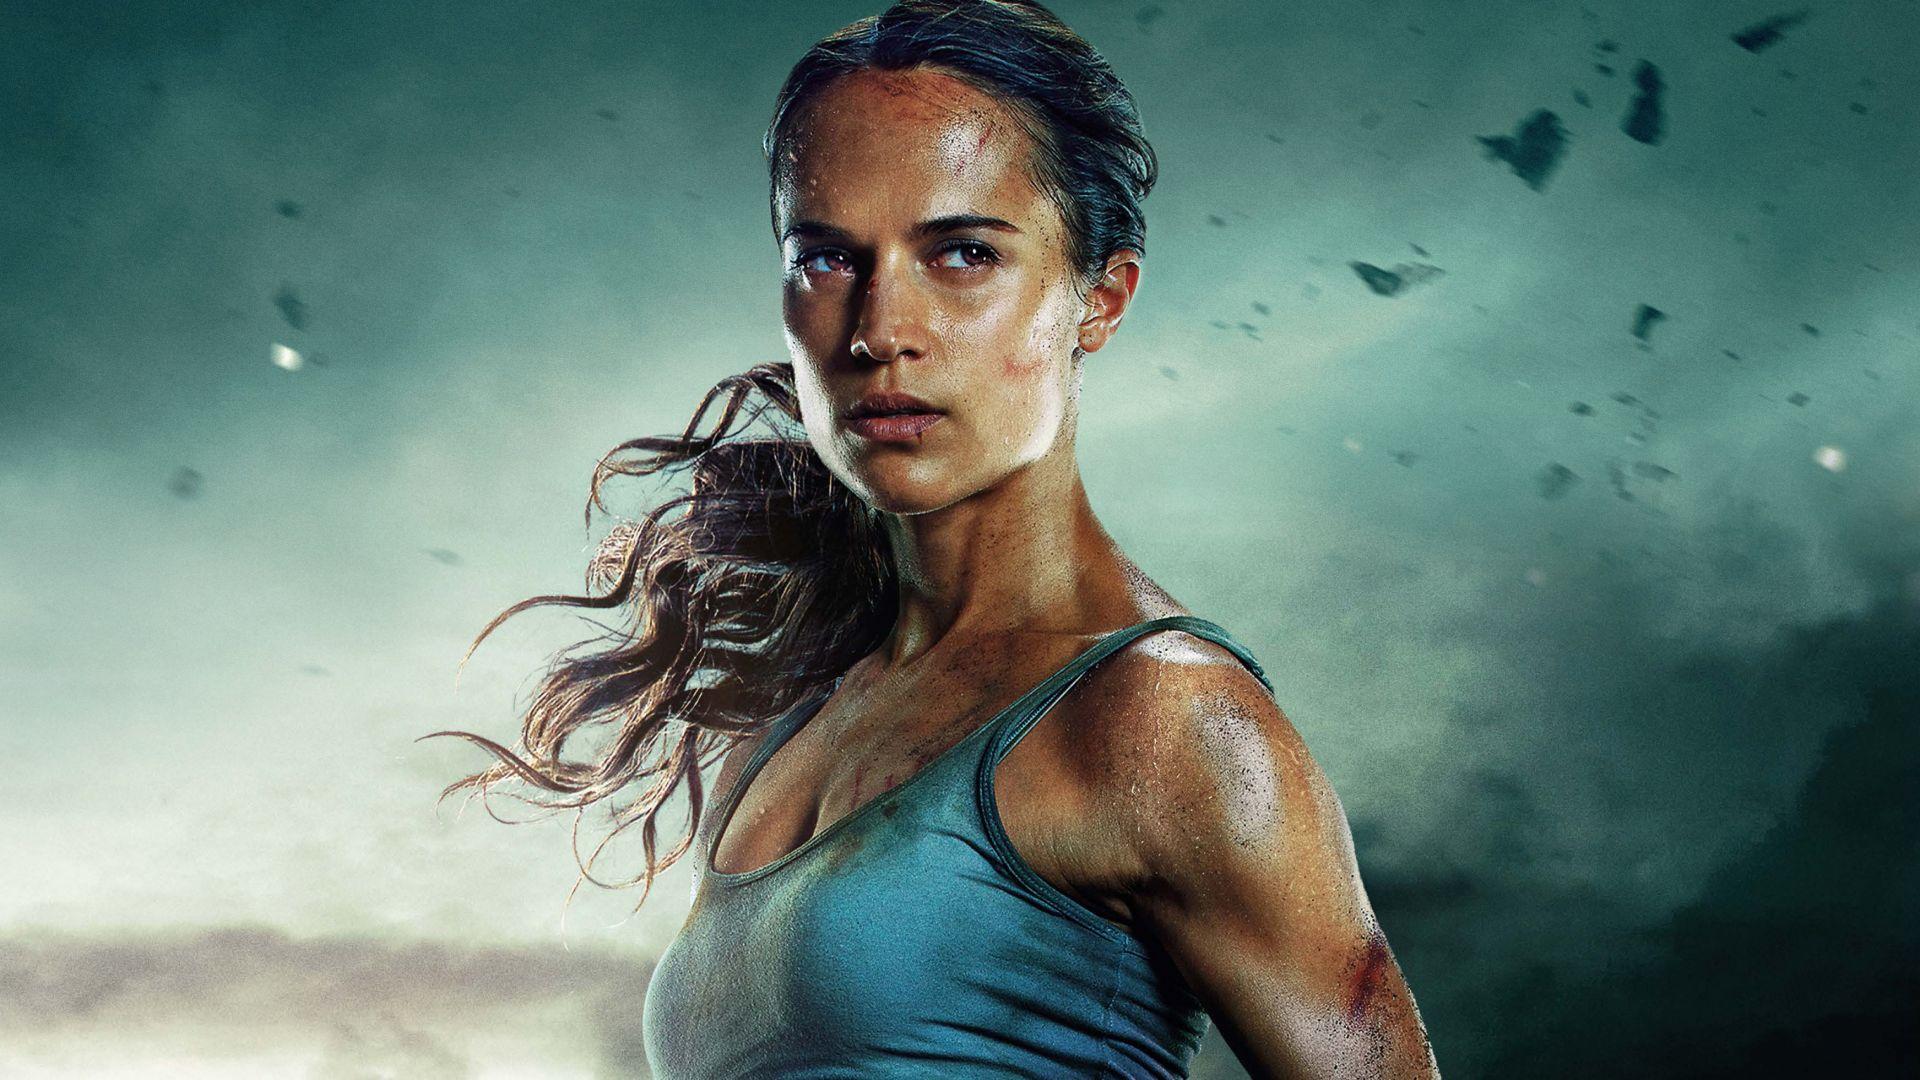 Wallpaper Alicia vikander, lara croft, tomb raider, movie 2018